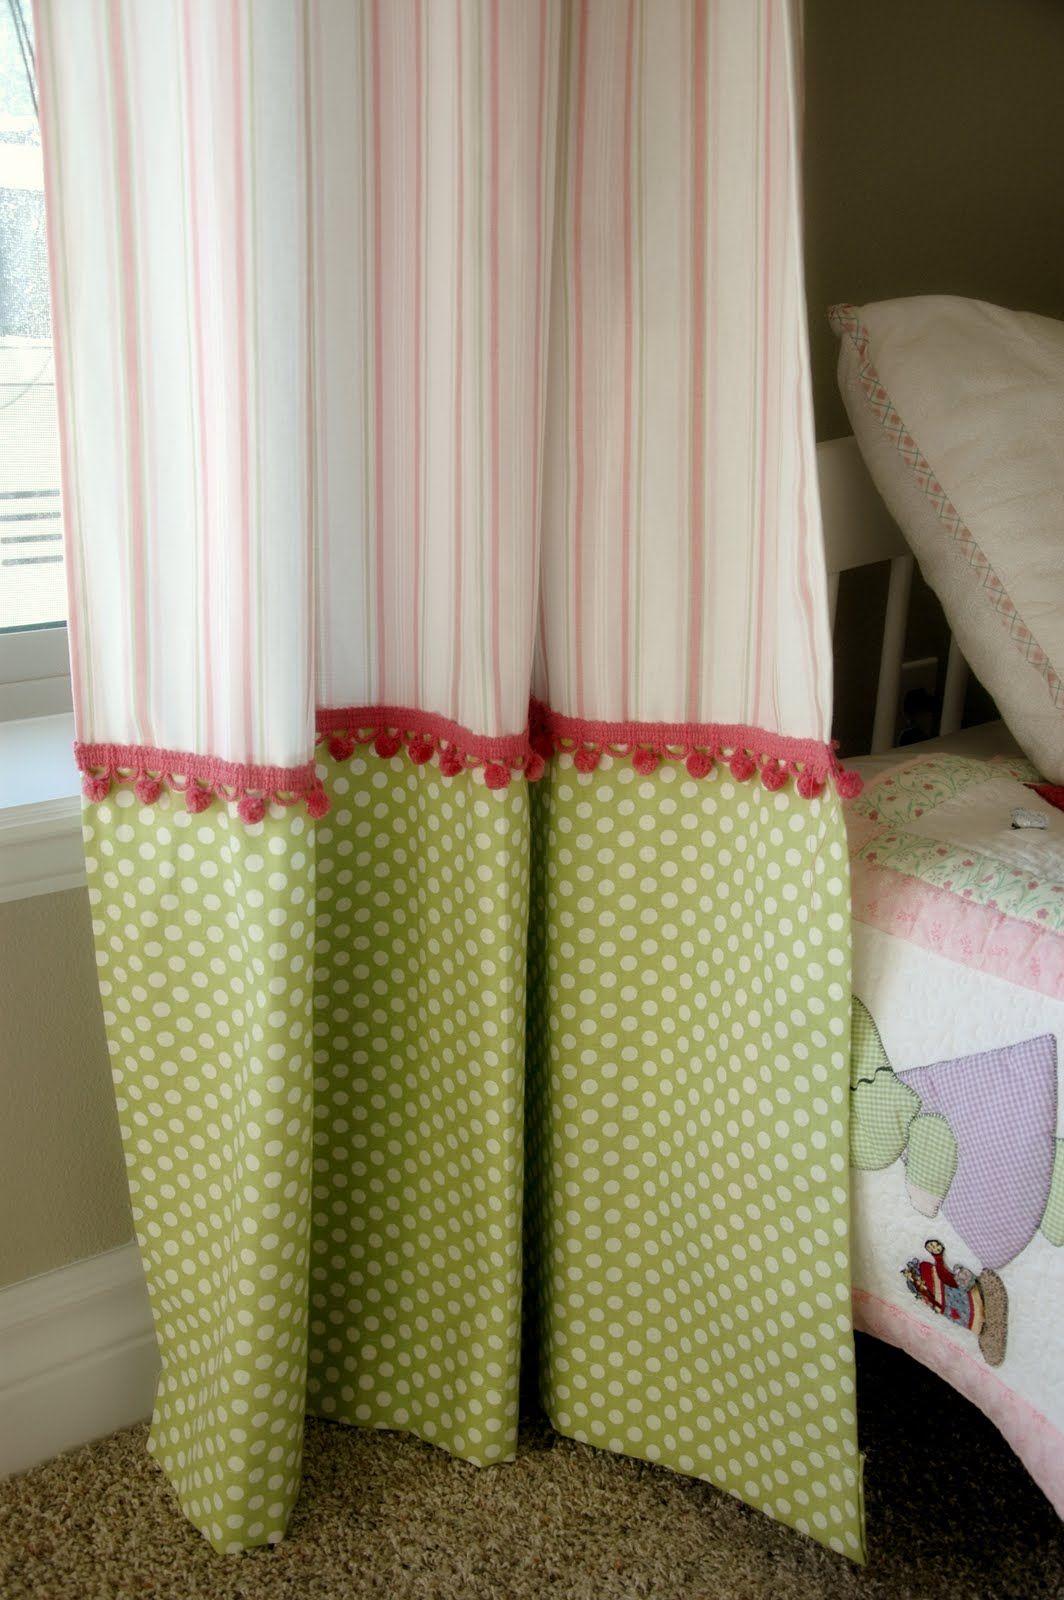 Zweifarbig Stoff Kinderzimmer Maja Pompon Borte Mittig Setzen